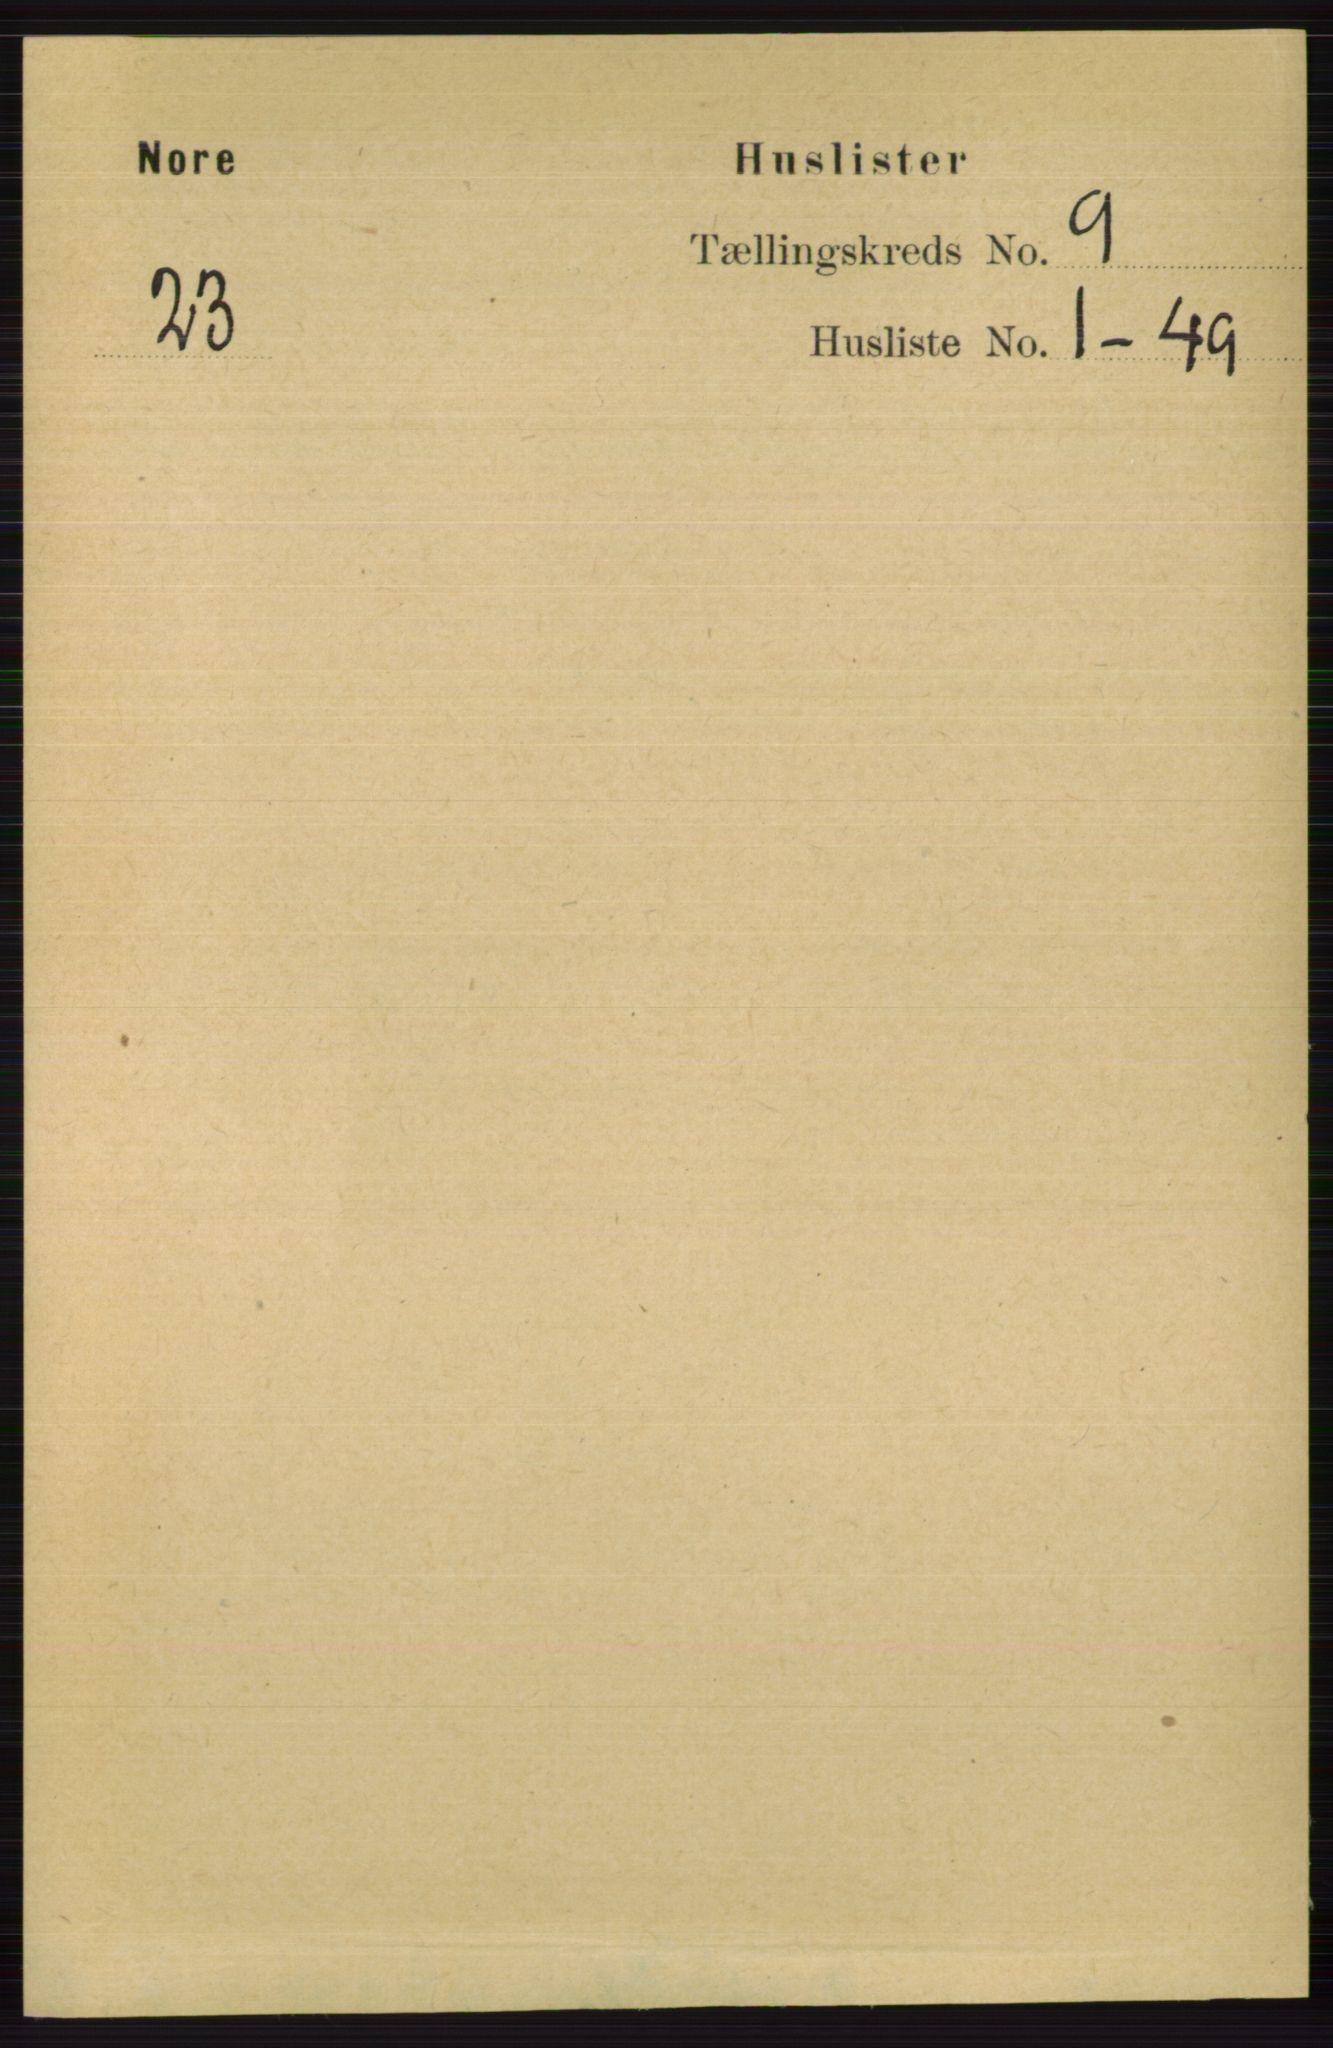 RA, Folketelling 1891 for 0633 Nore herred, 1891, s. 3152